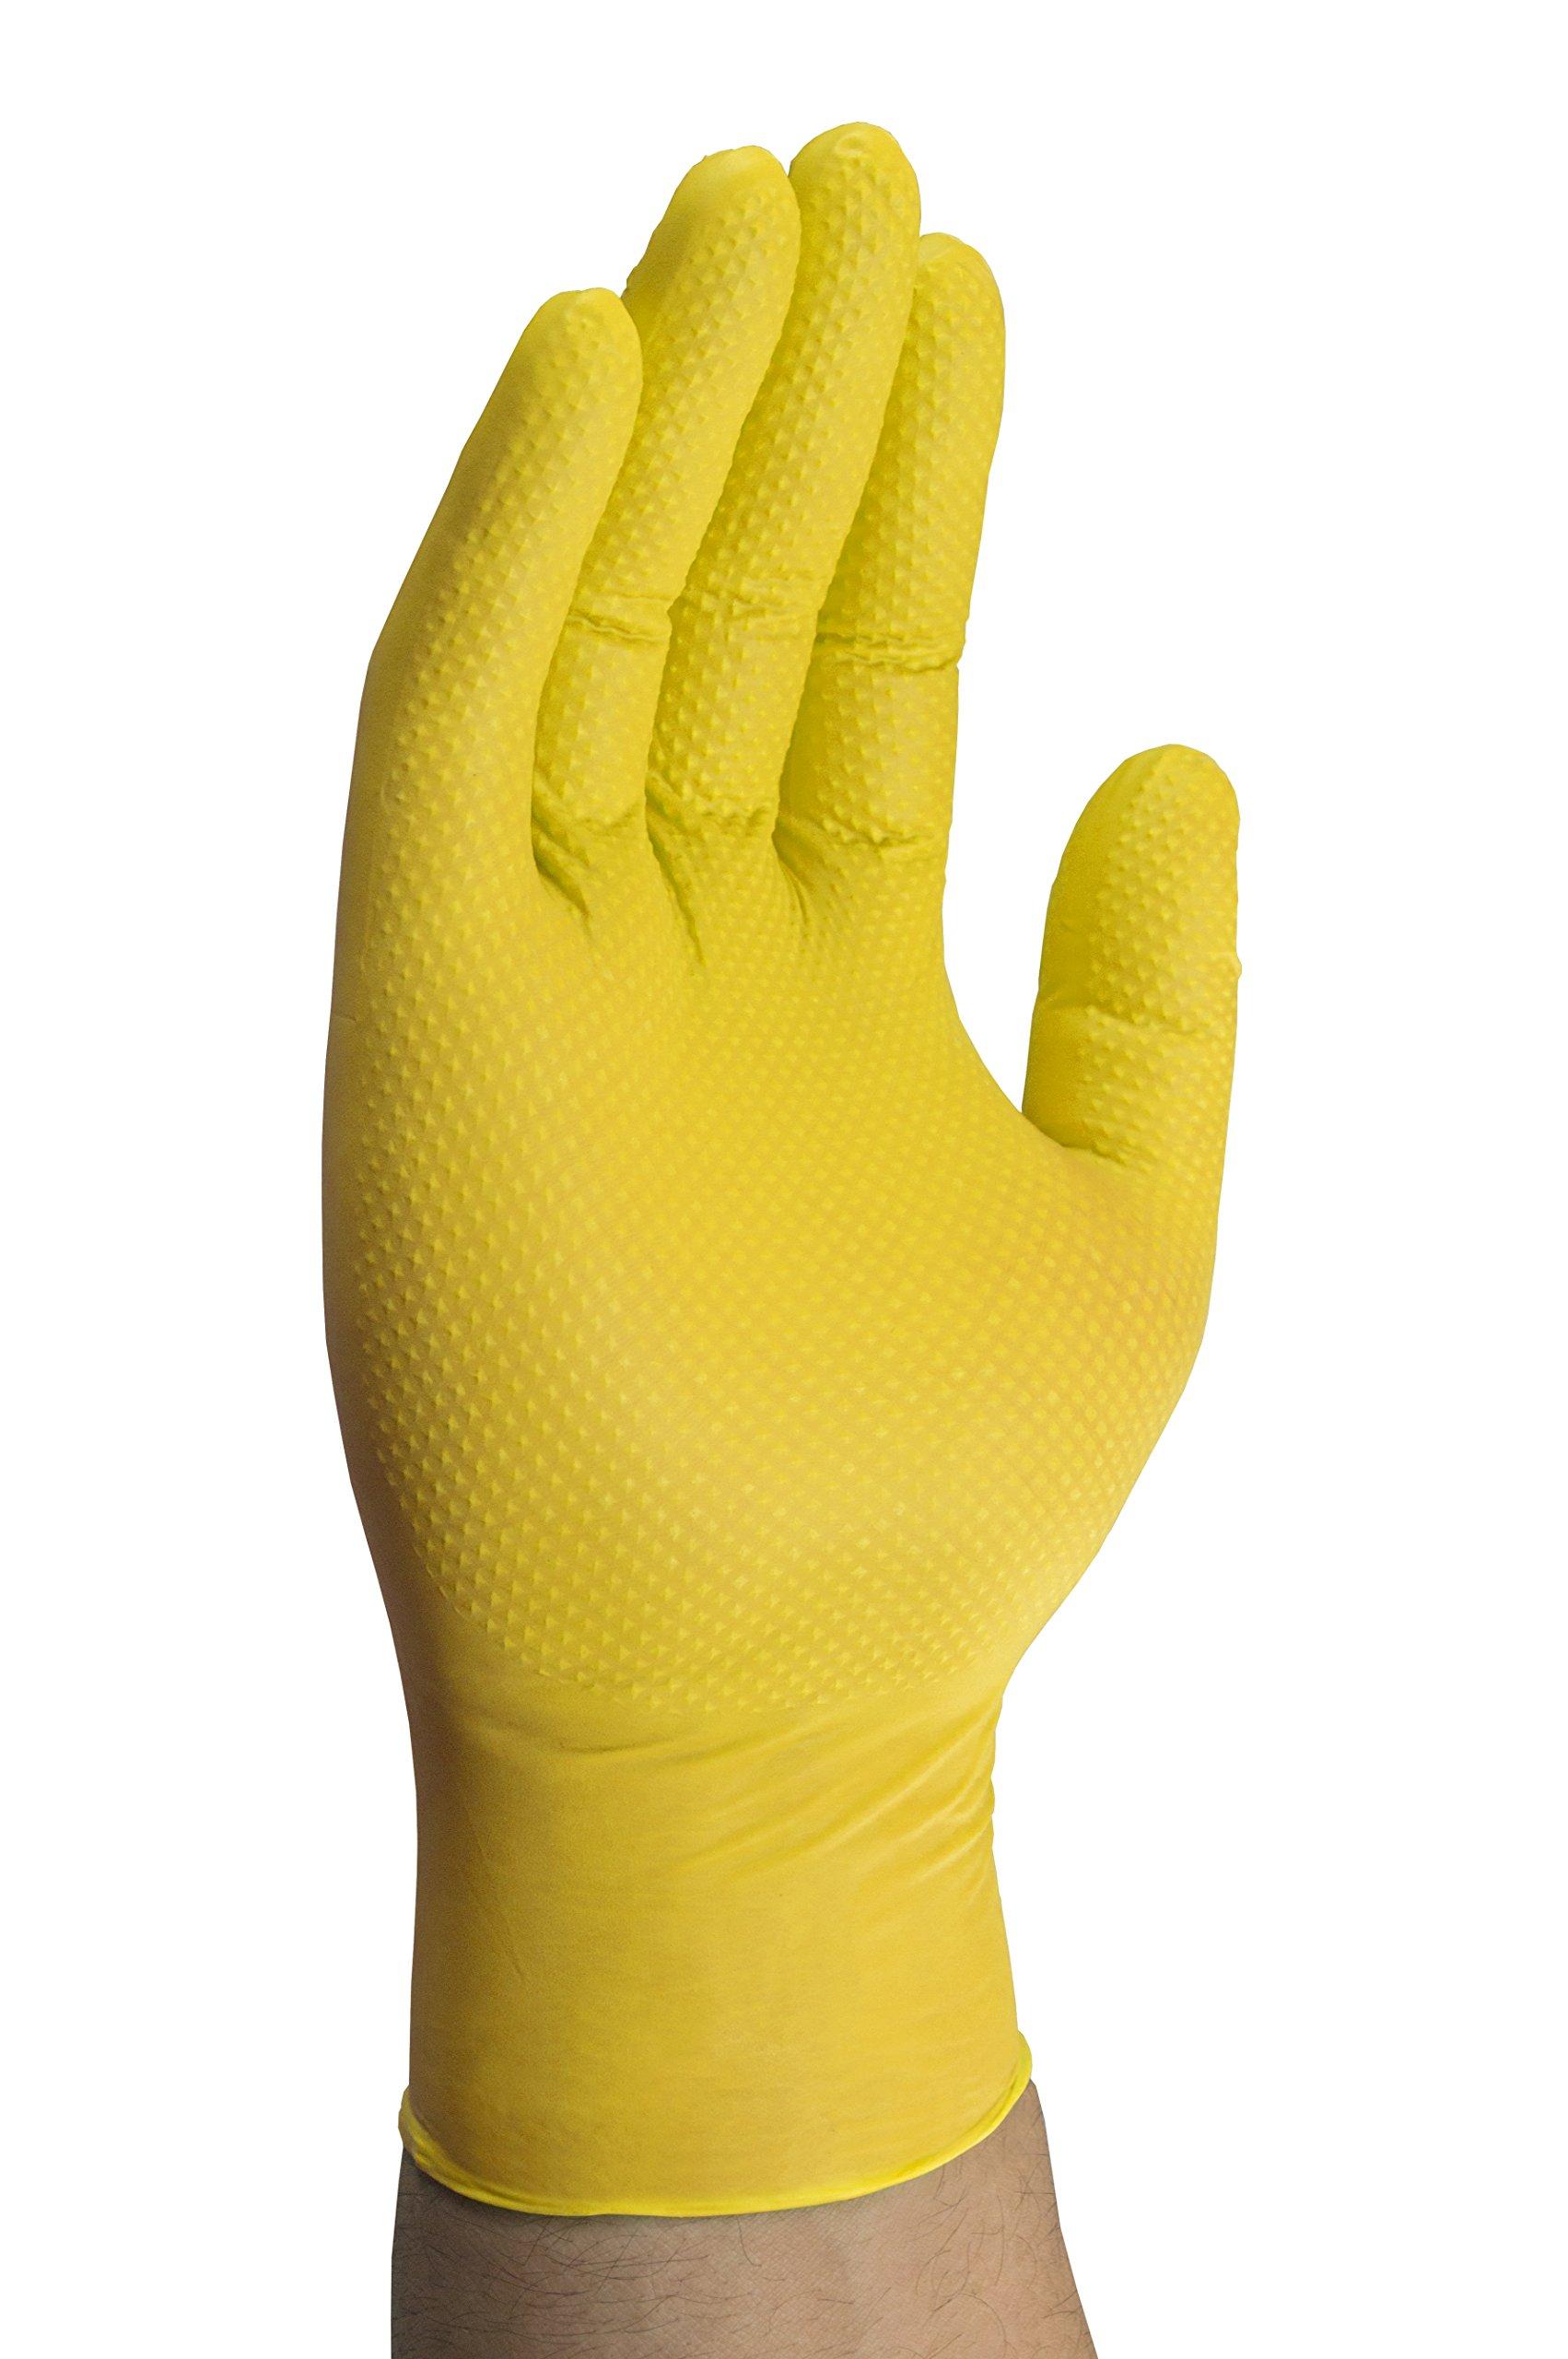 Mechanix Wear - Nitrile Disposable Gloves - Powder Free, Latex Free, Diamond Textured - 8 mil Yellow (Large, 100 Pack) by Mechanix Wear (Image #3)